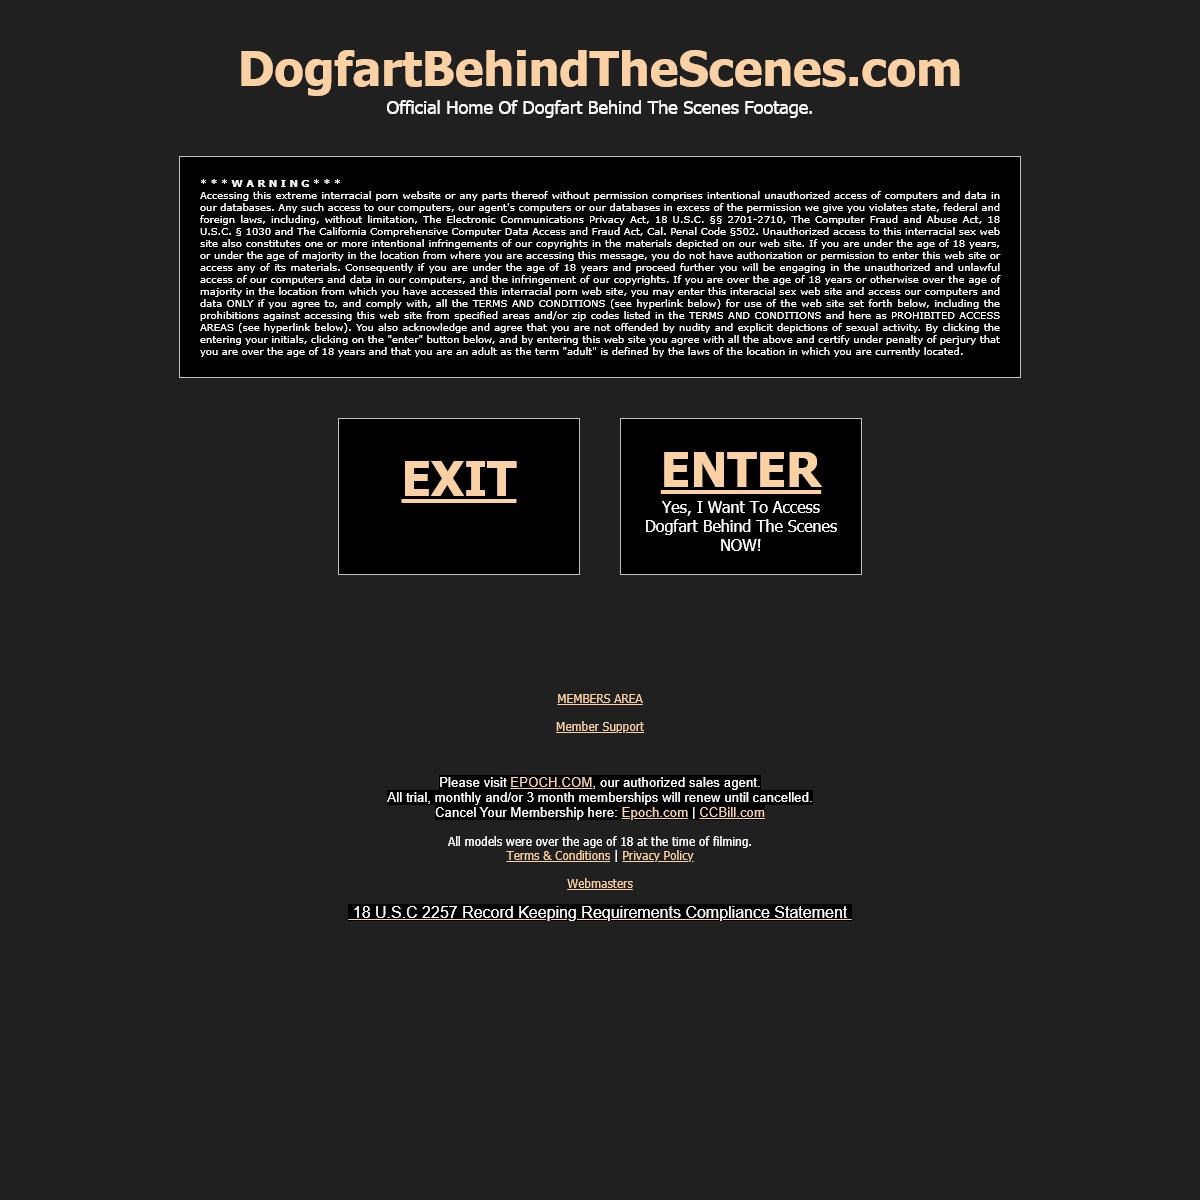 A complete backup of www.dogfartbehindthescenes.com